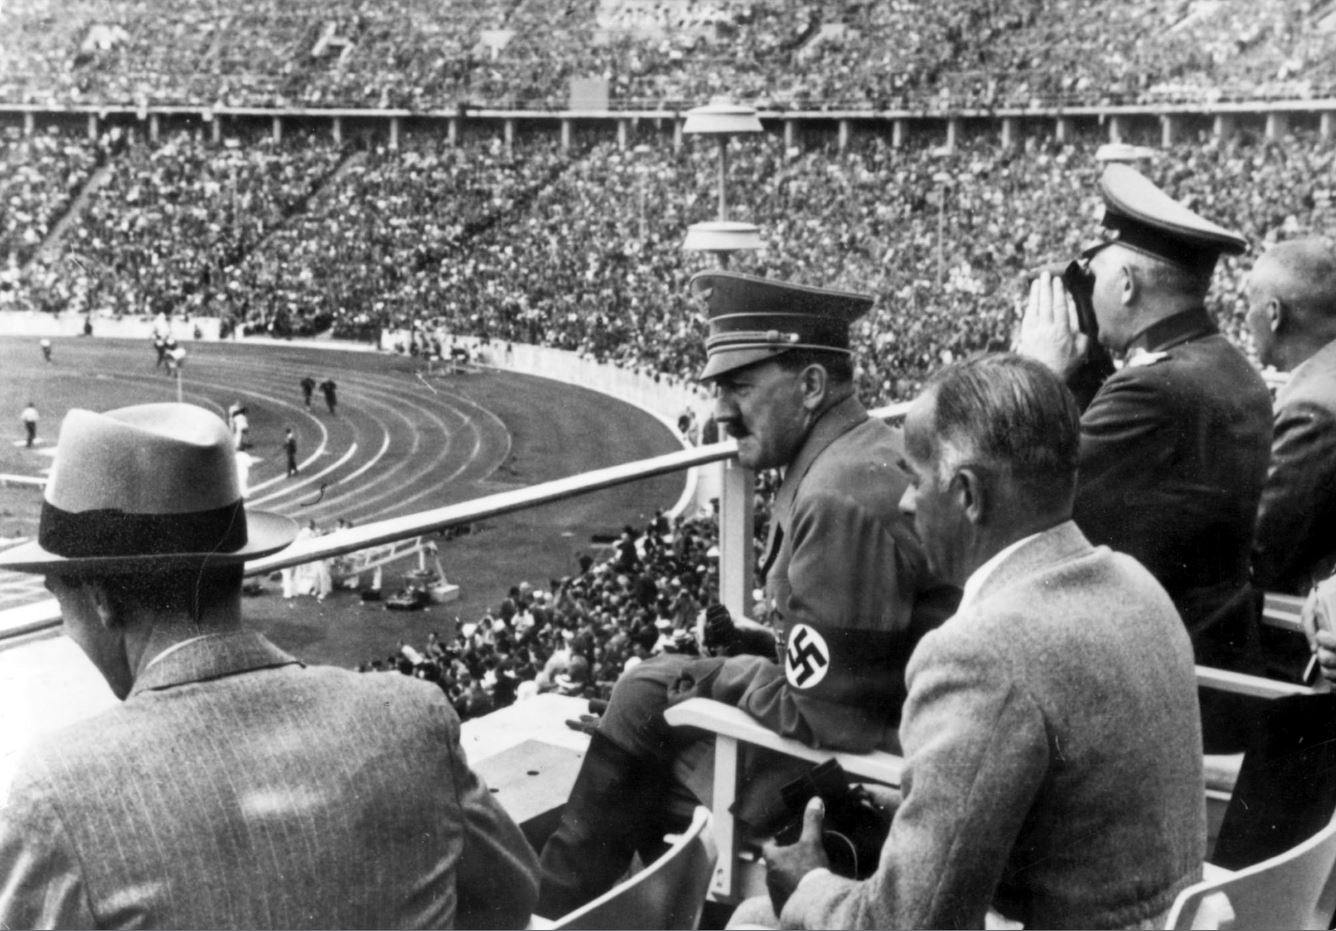 O Αδόλφος Χίτλερ, ο υπουργός προπαγάνδας Γιόζεφ Γκέμπελς, ο υπουργός Αθλητισμού Χανς φον Τσάμερ και άλλοι ανώτατοι αξιωματούχοι του Τρίτου Ράιχ παρακολουθούν την τελετή έναρξης των Ολυμπιακών Αγώνων του Βερολίνου, το 1936. (ΑP Photo) - Πηγή Καθημερινή